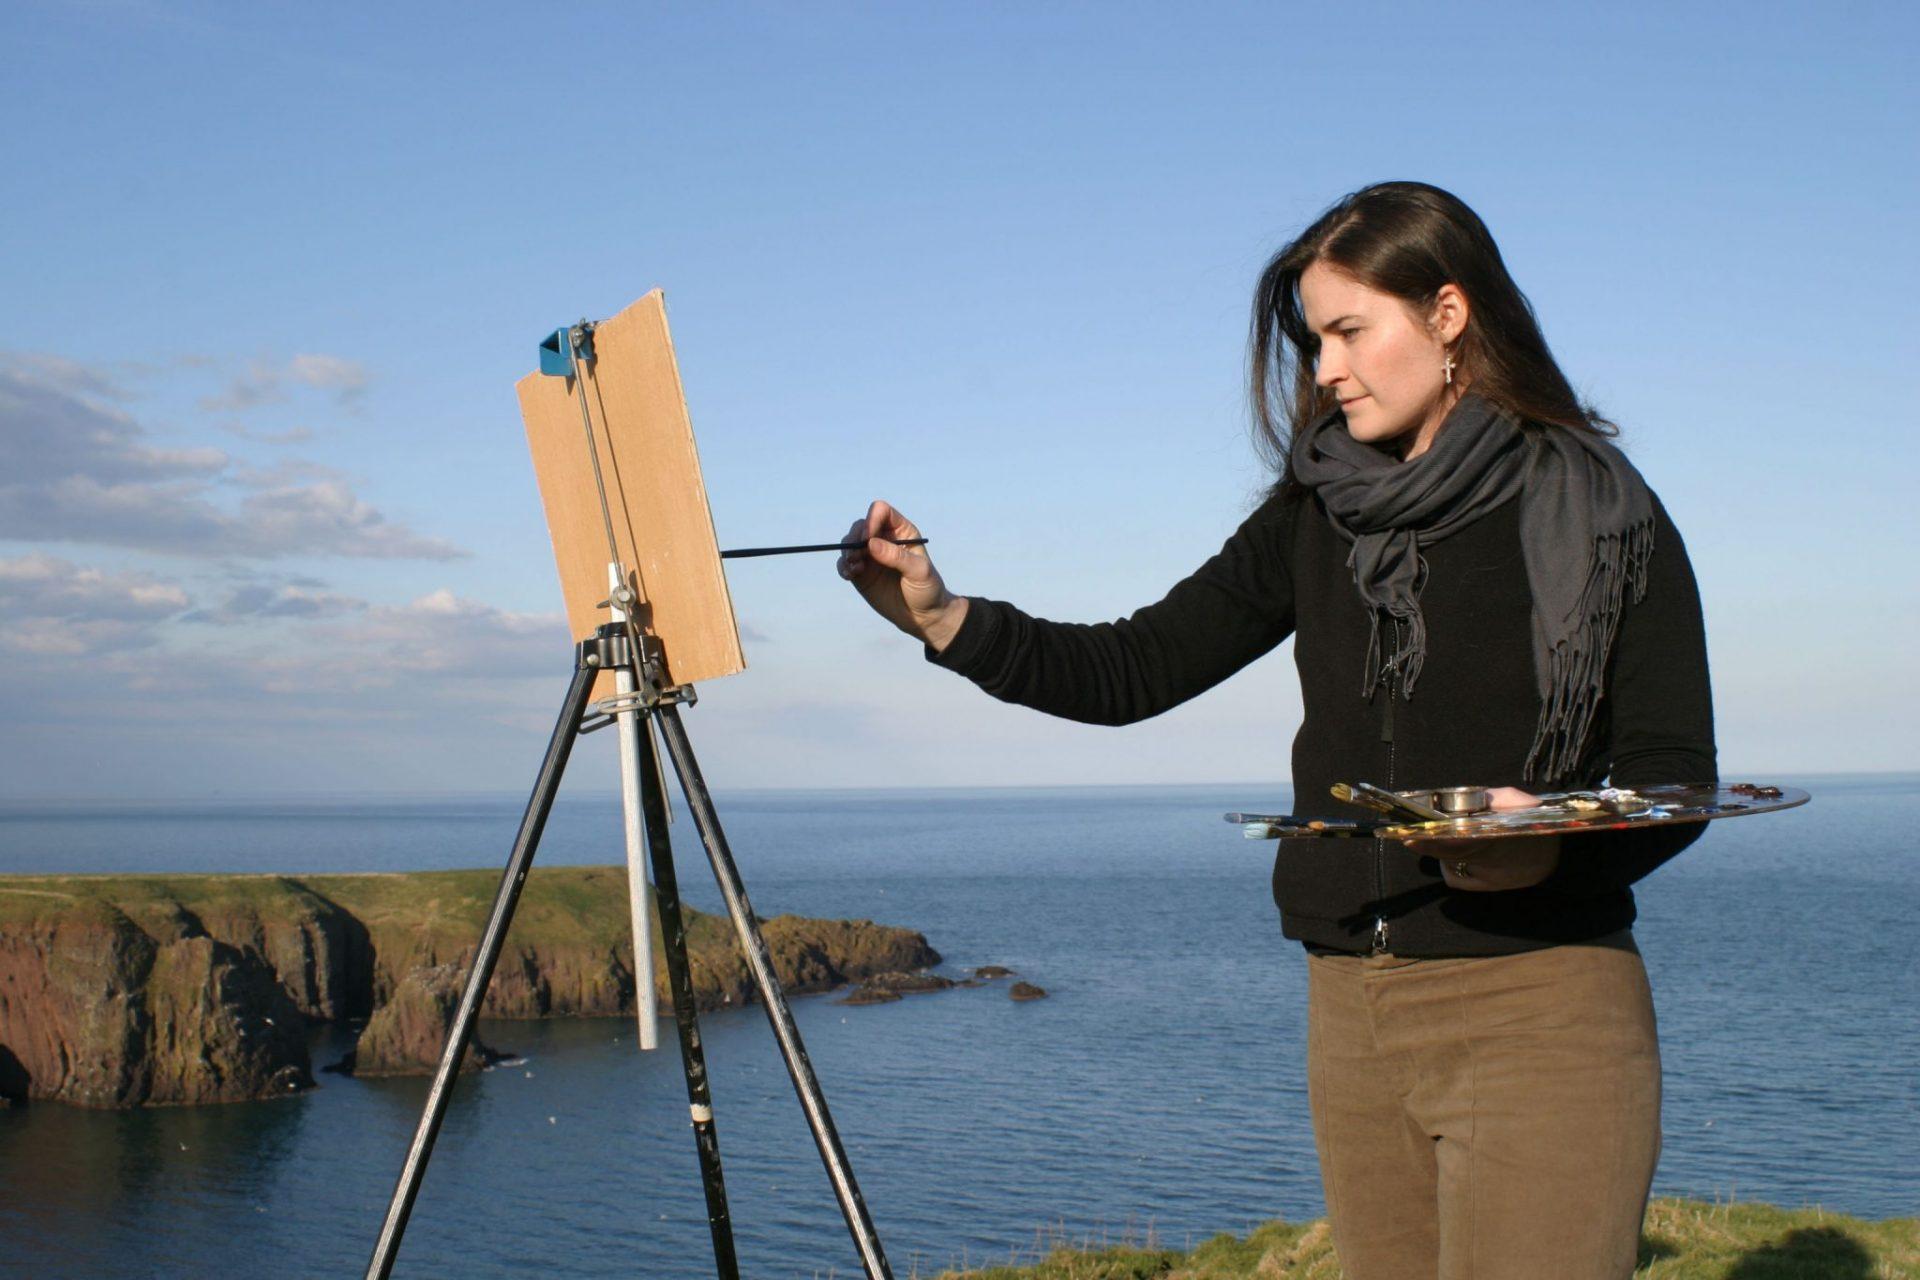 Rebecca King Hawkinson at work in Dingle Ireland